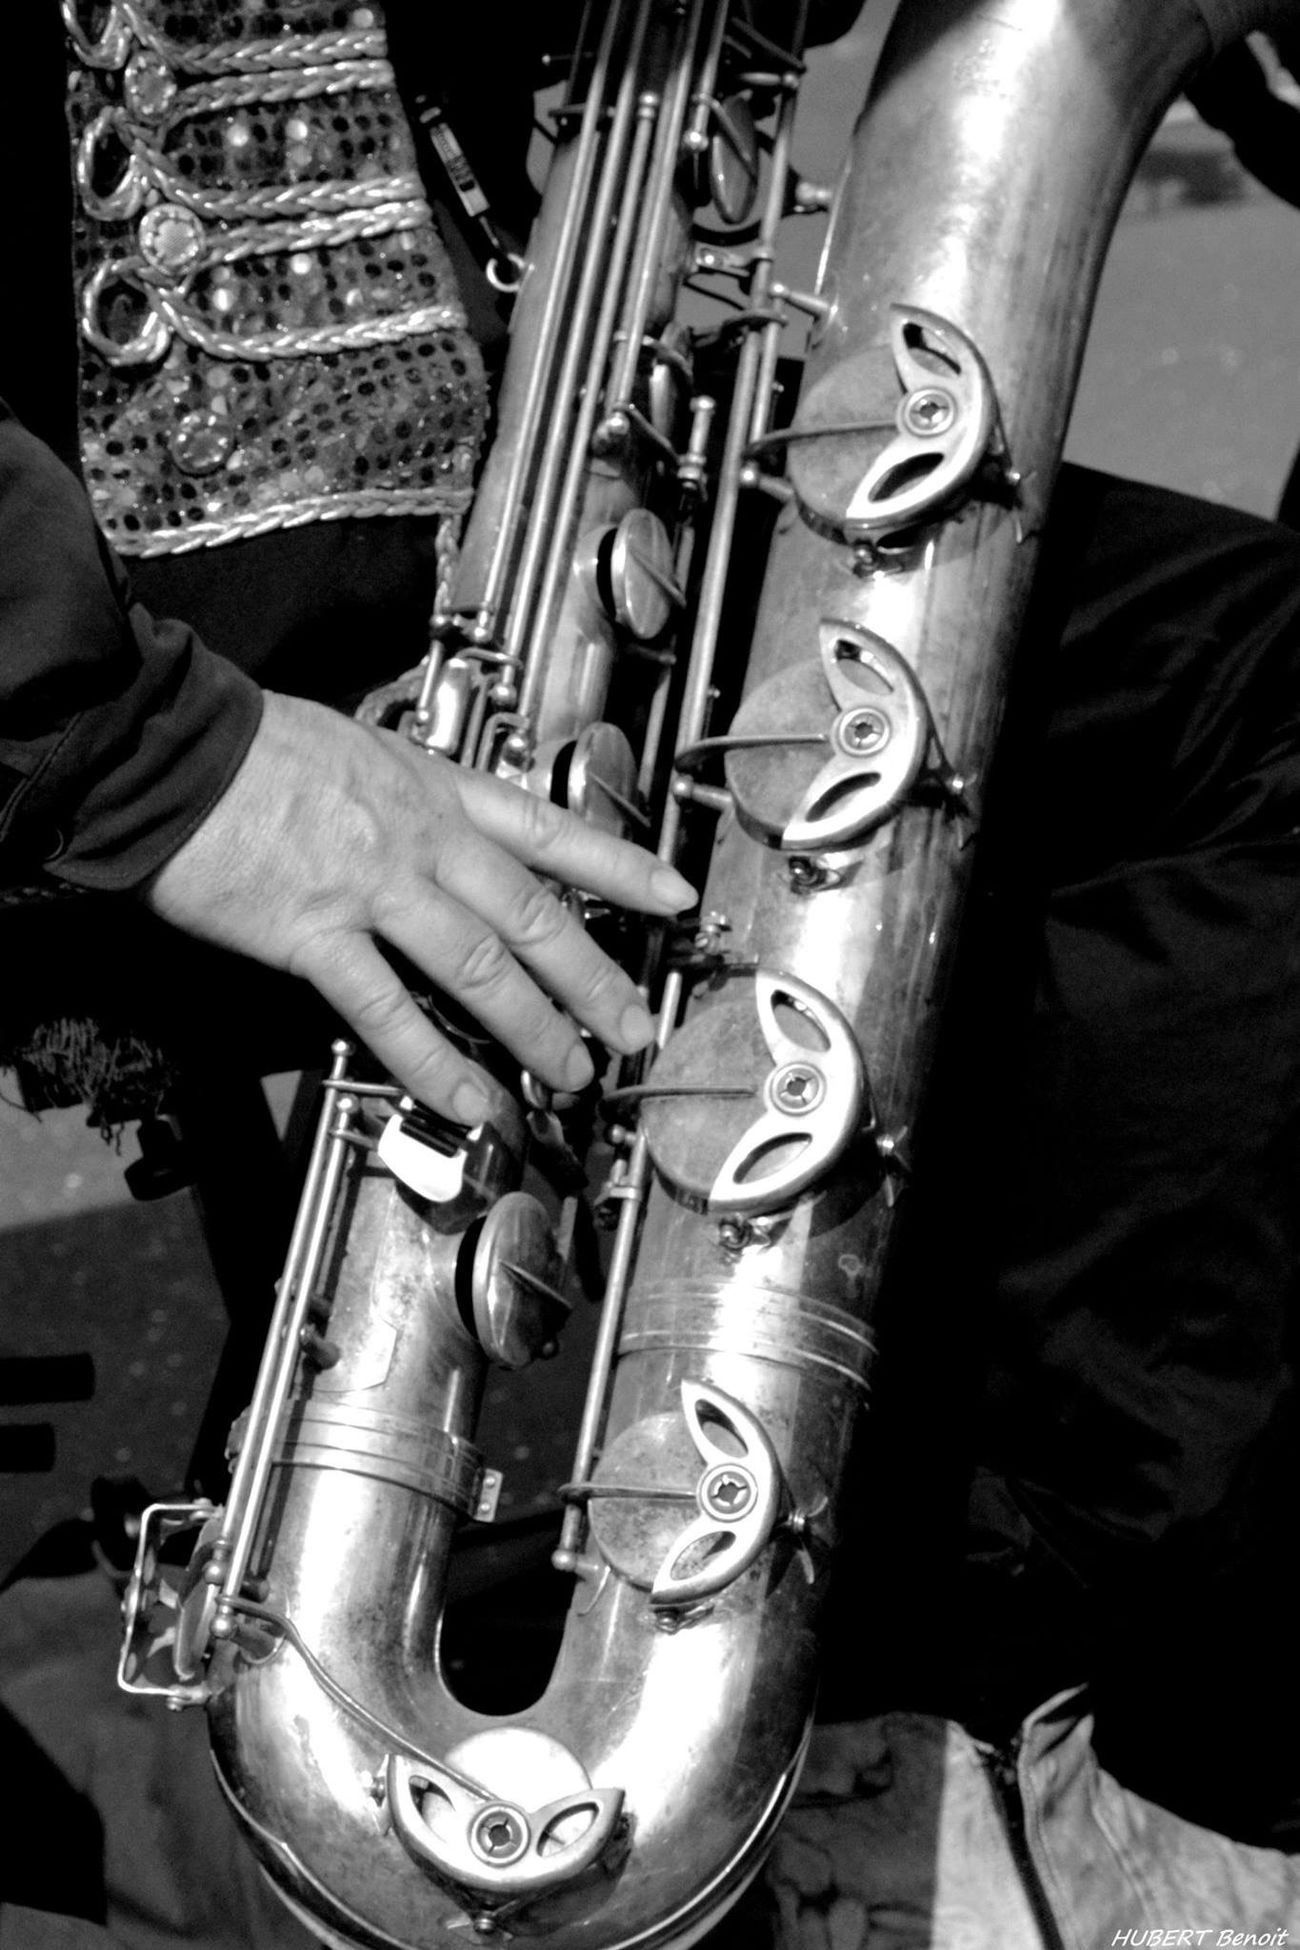 Musique Music Musicien Musician Noiretblanc Blackandwhite